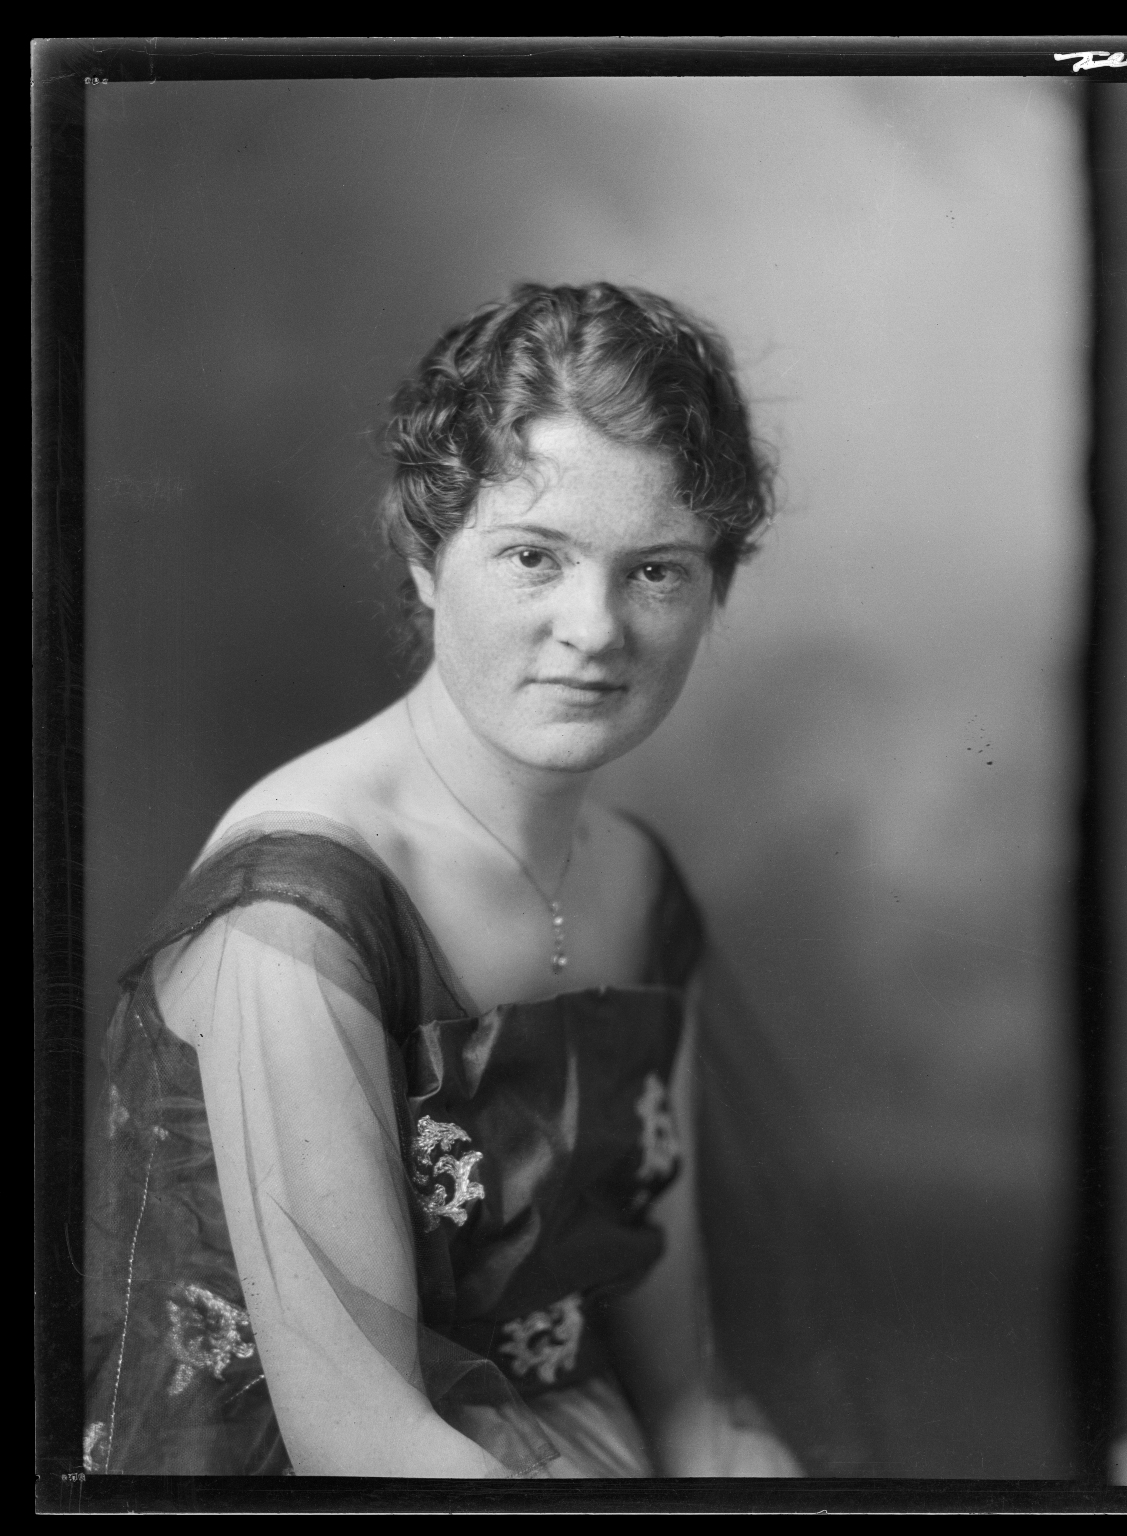 Portraits of Leona Vincent